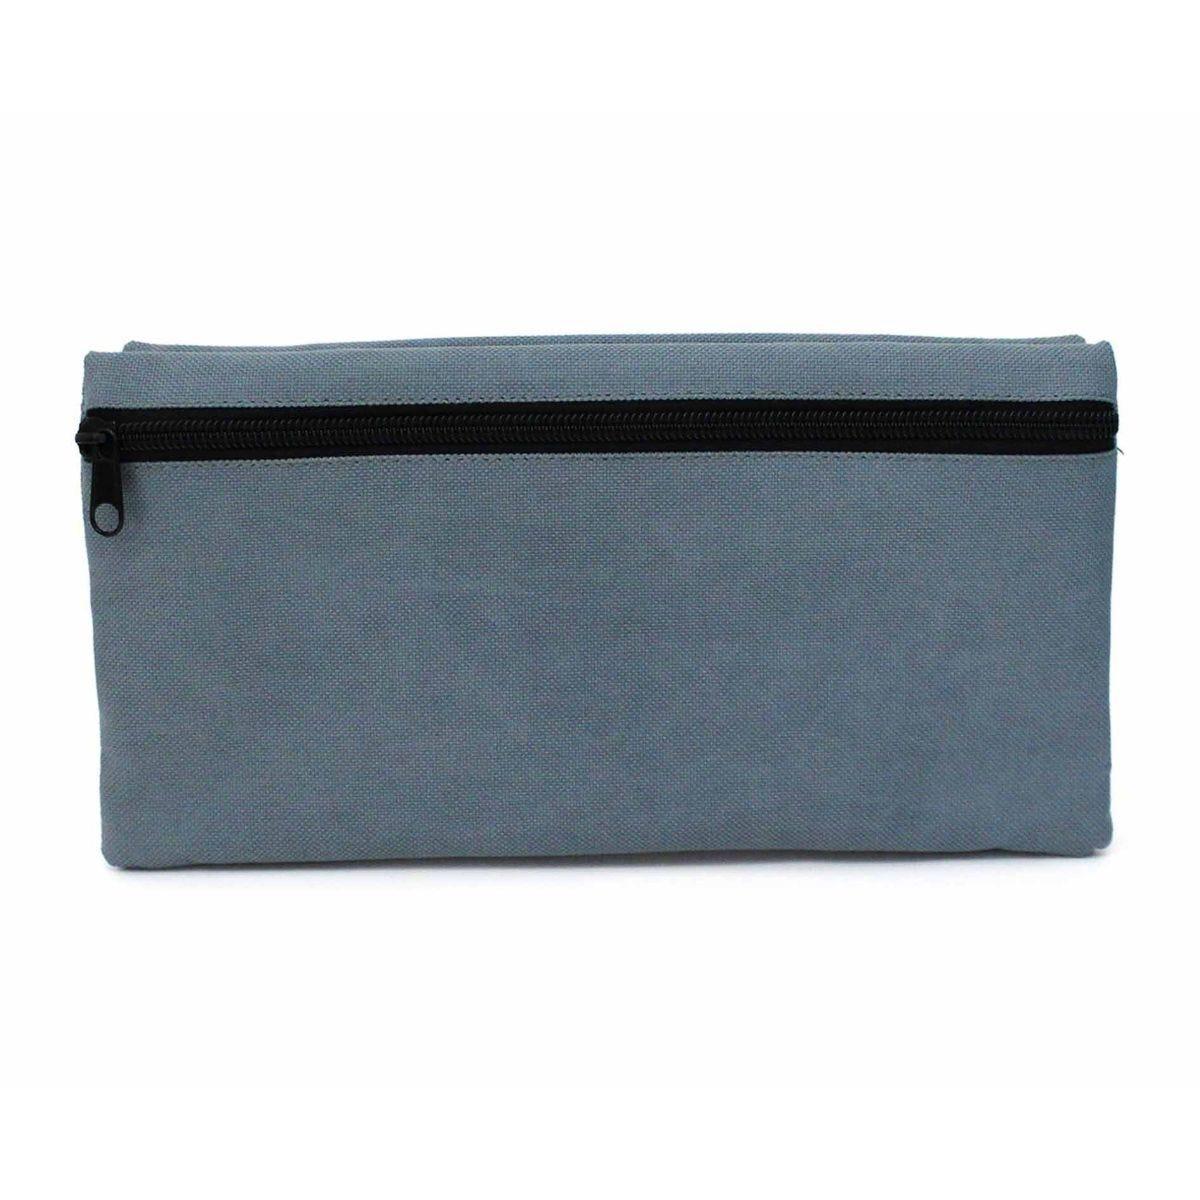 Large Double Pocket Black Pencil Case Grey Zip